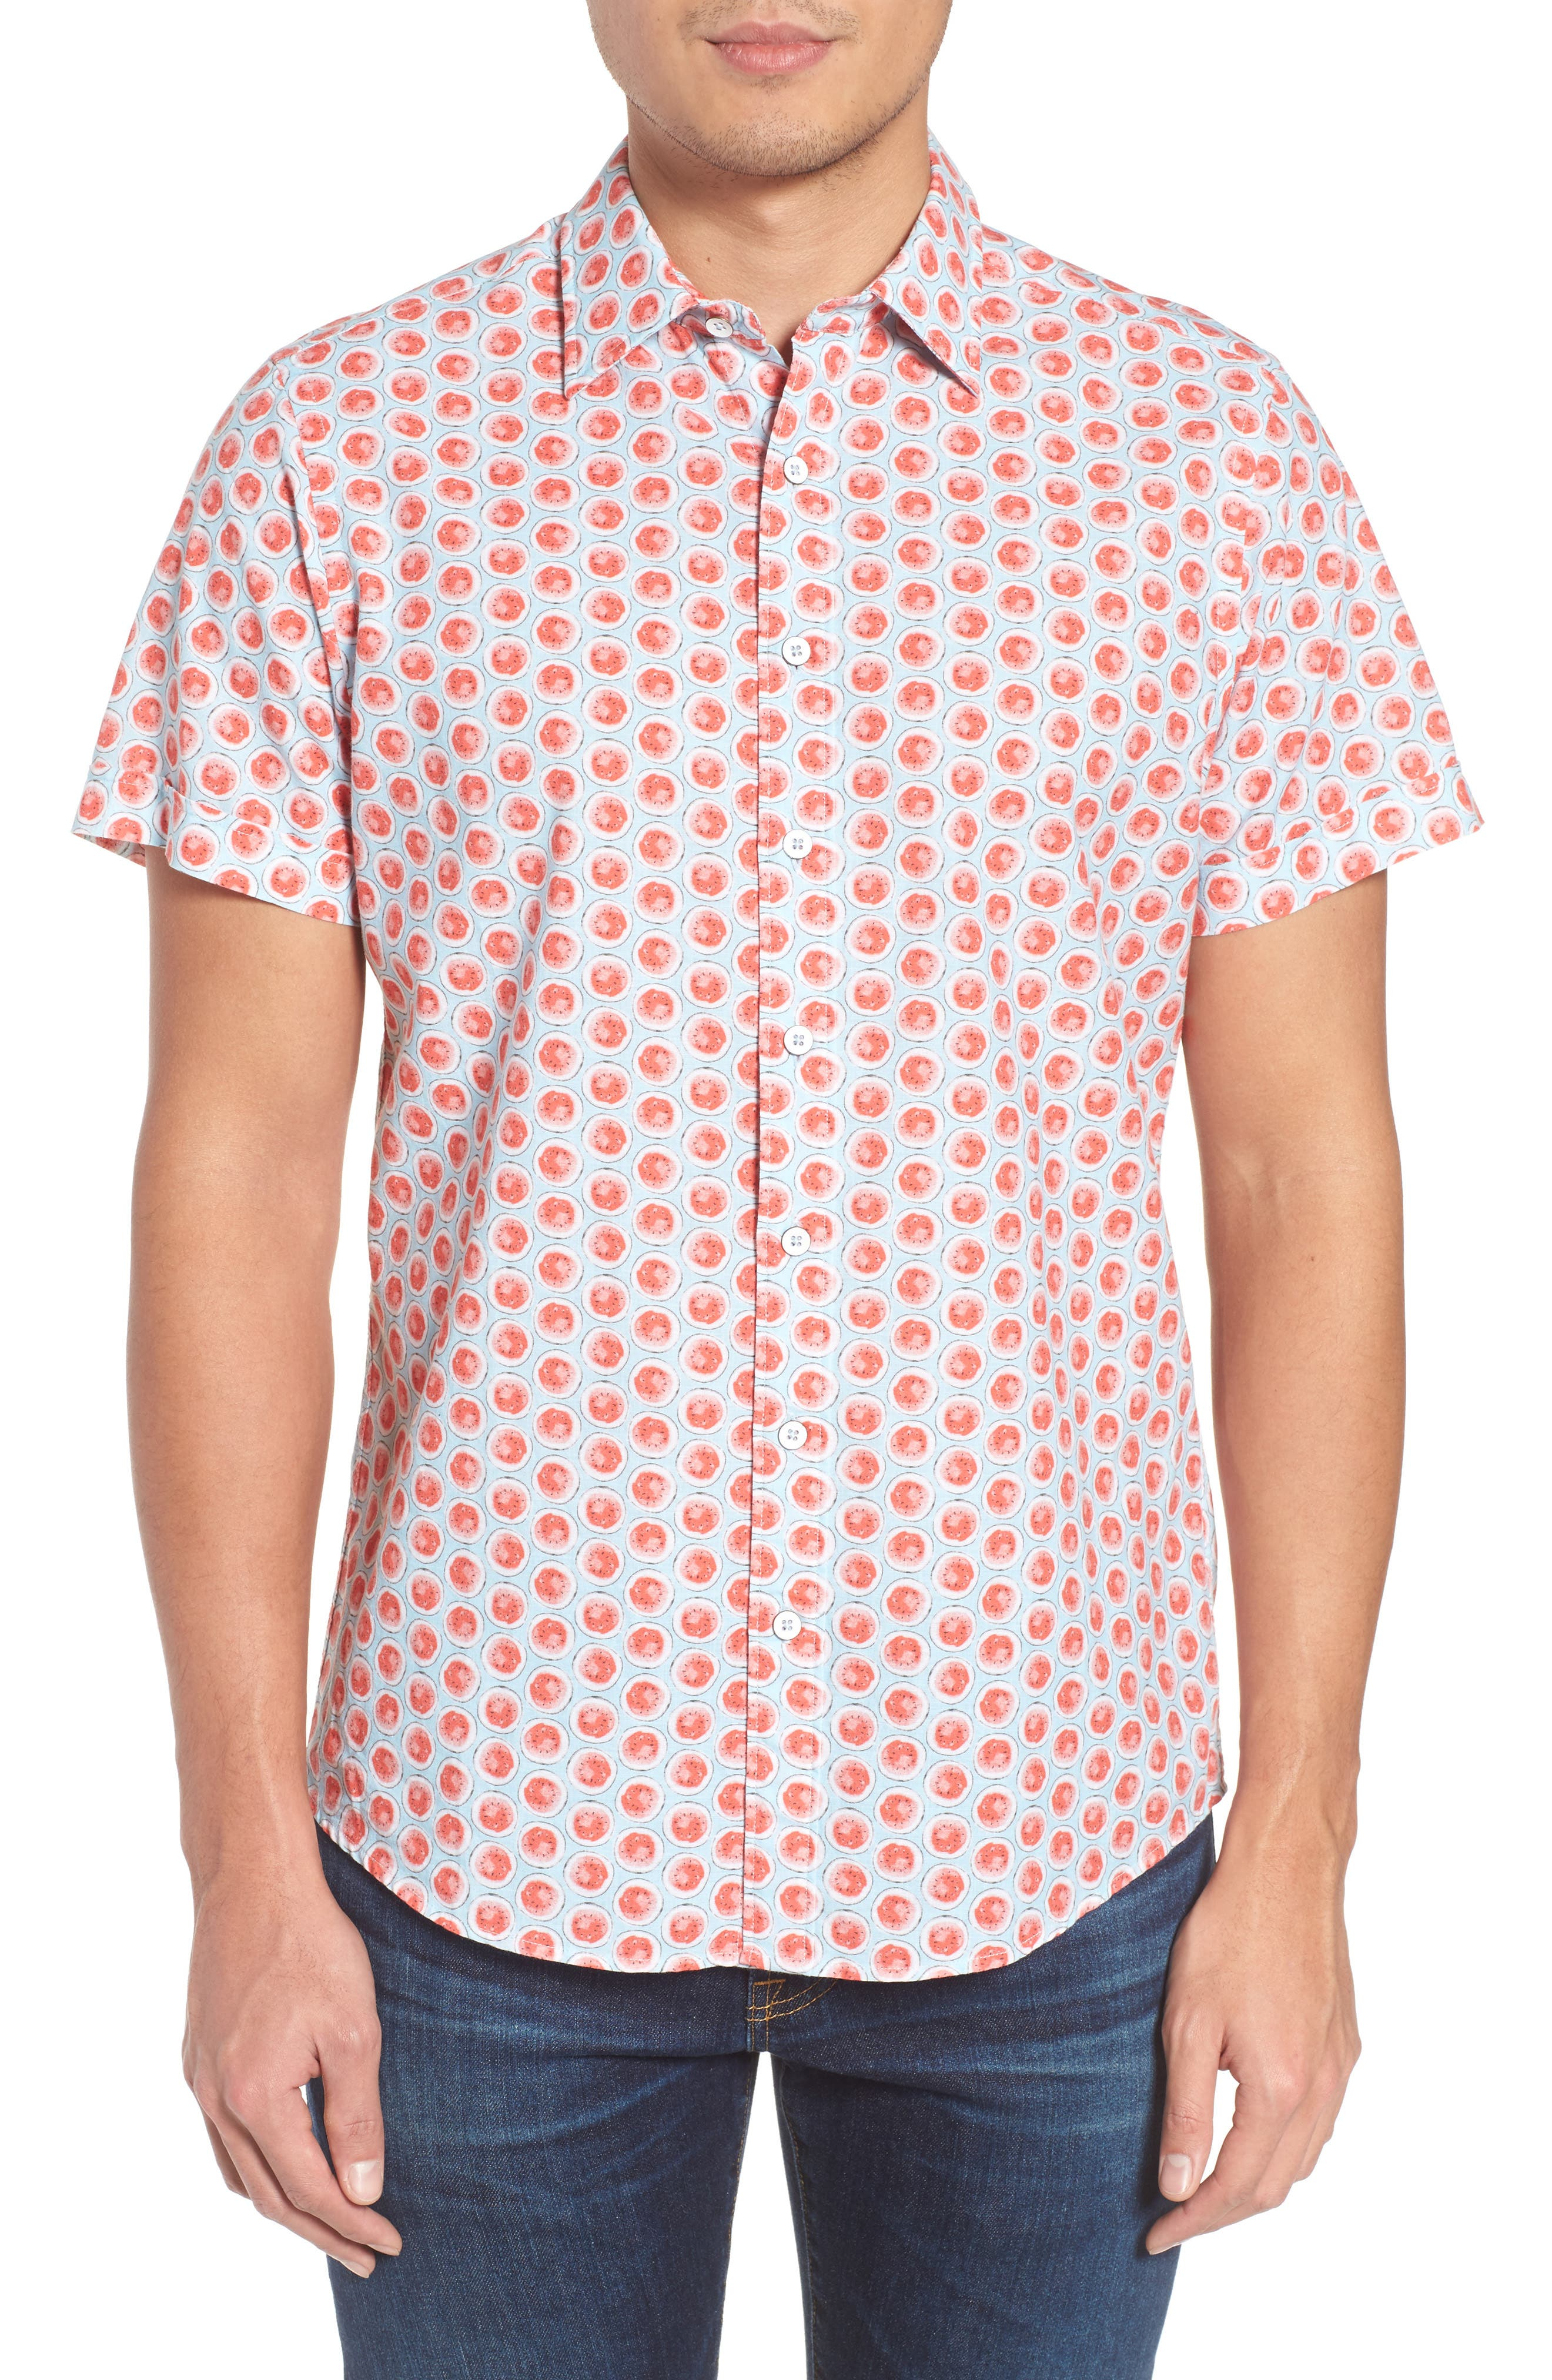 Mellons Bay Regular Fit Sport Shirt,                         Main,                         color, Watermelon